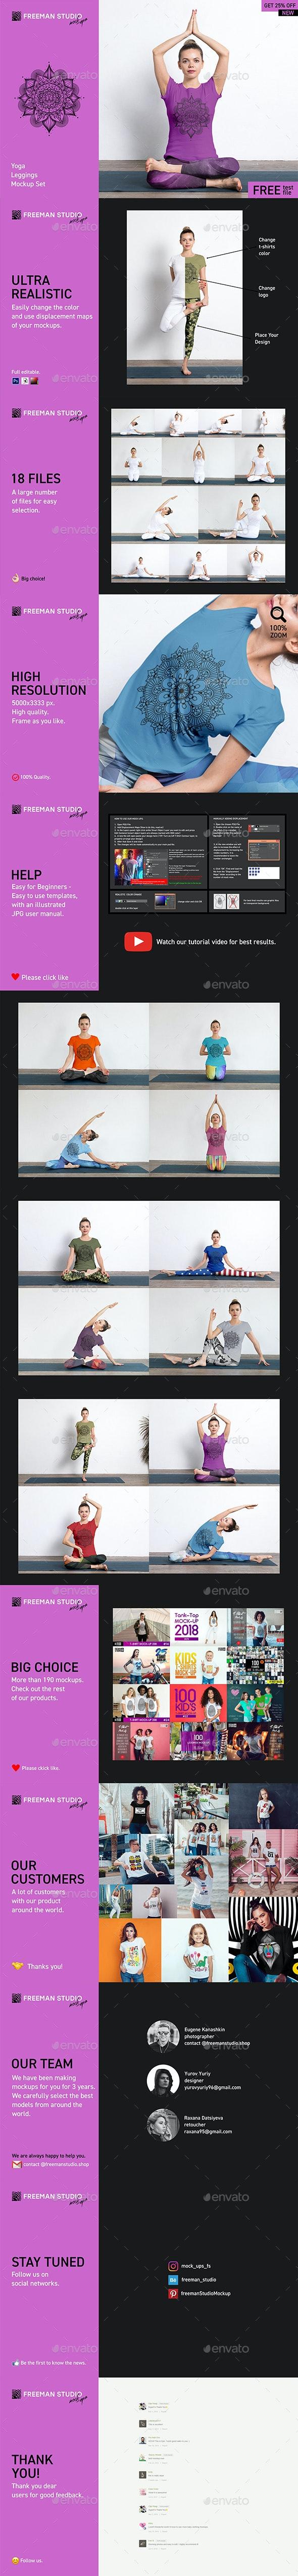 Yoga Leggings Mock-Up Set - Product Mock-Ups Graphics